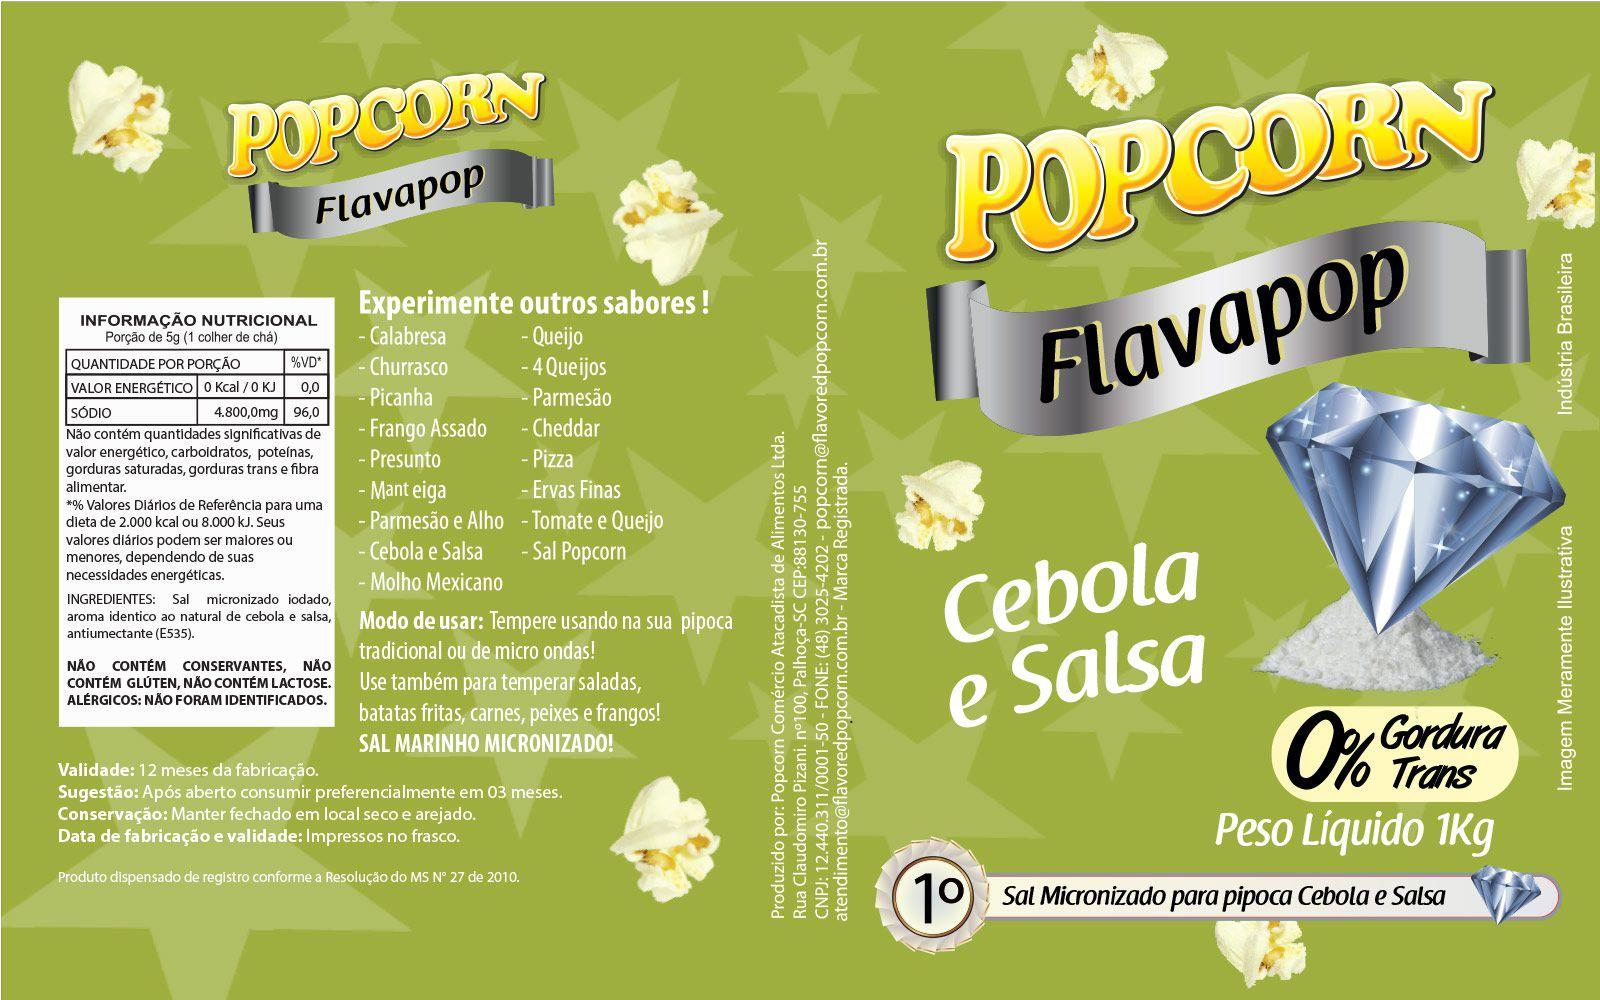 FLAVAPOP - Original de cinema -  Cebola e Salsa - Micronizado Popcorn  - Pct 1kg